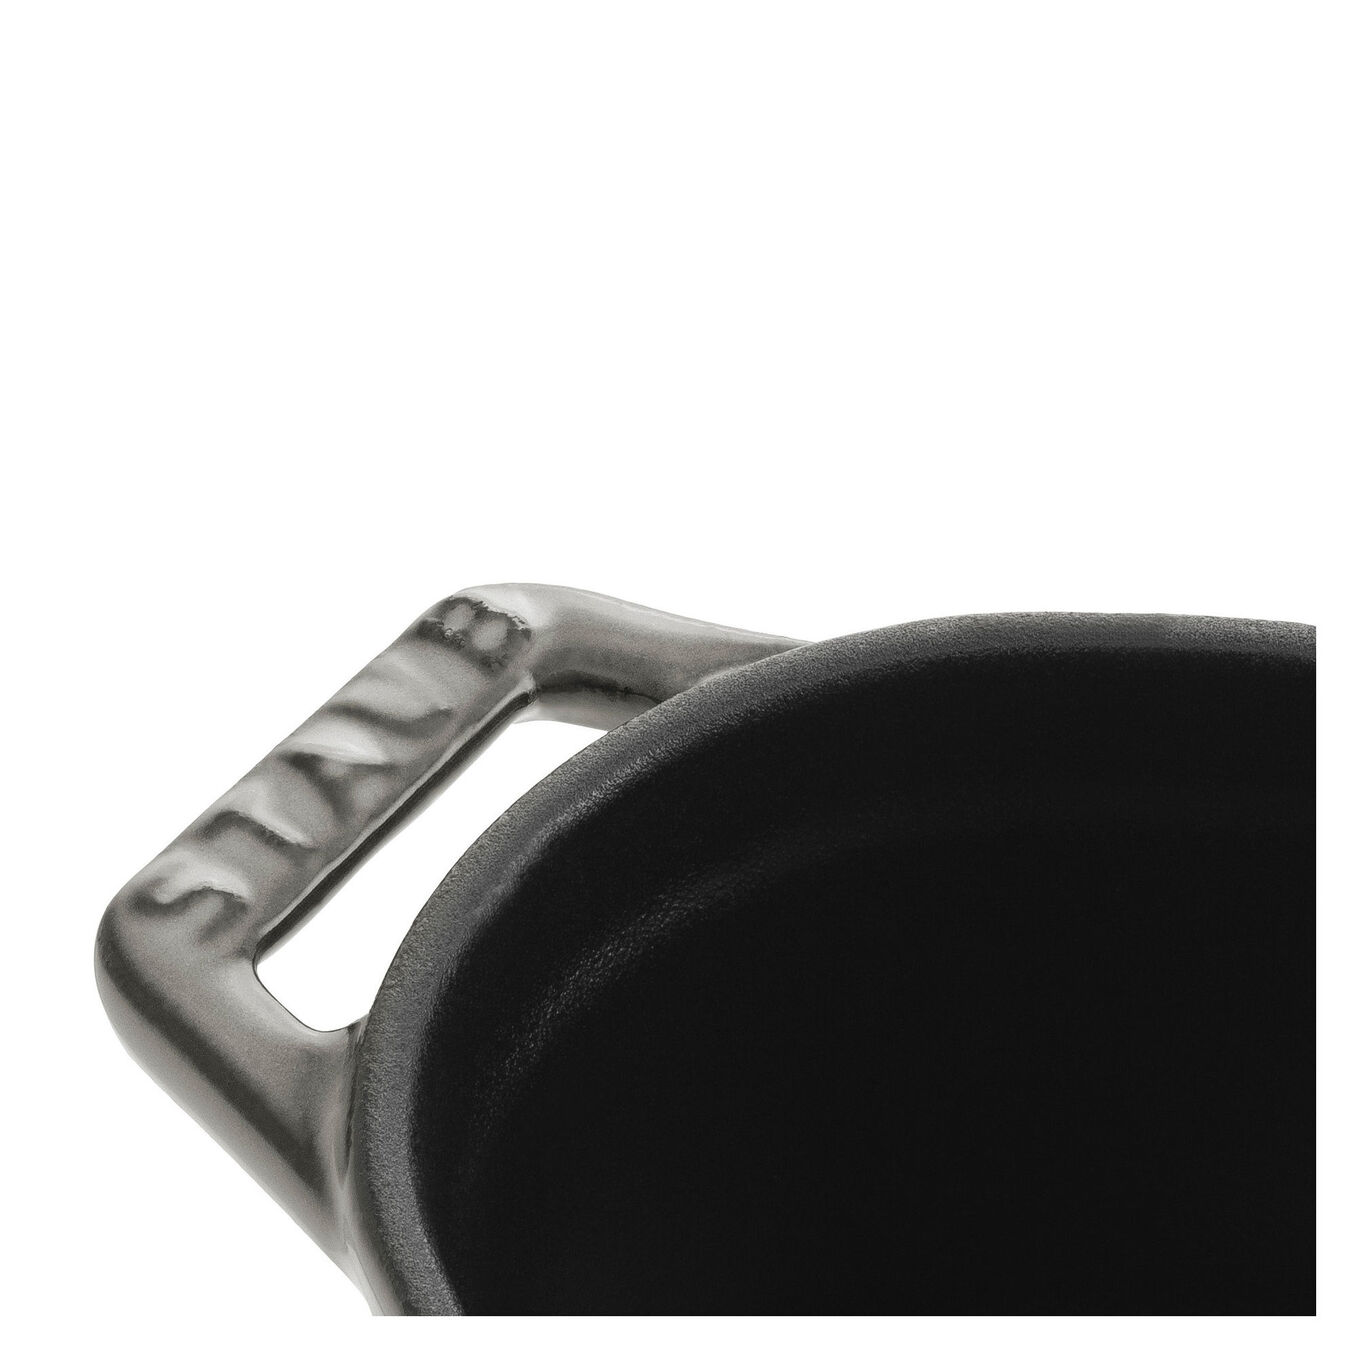 Mini cocotte ovale - 11 cm, grigio grafite,,large 3